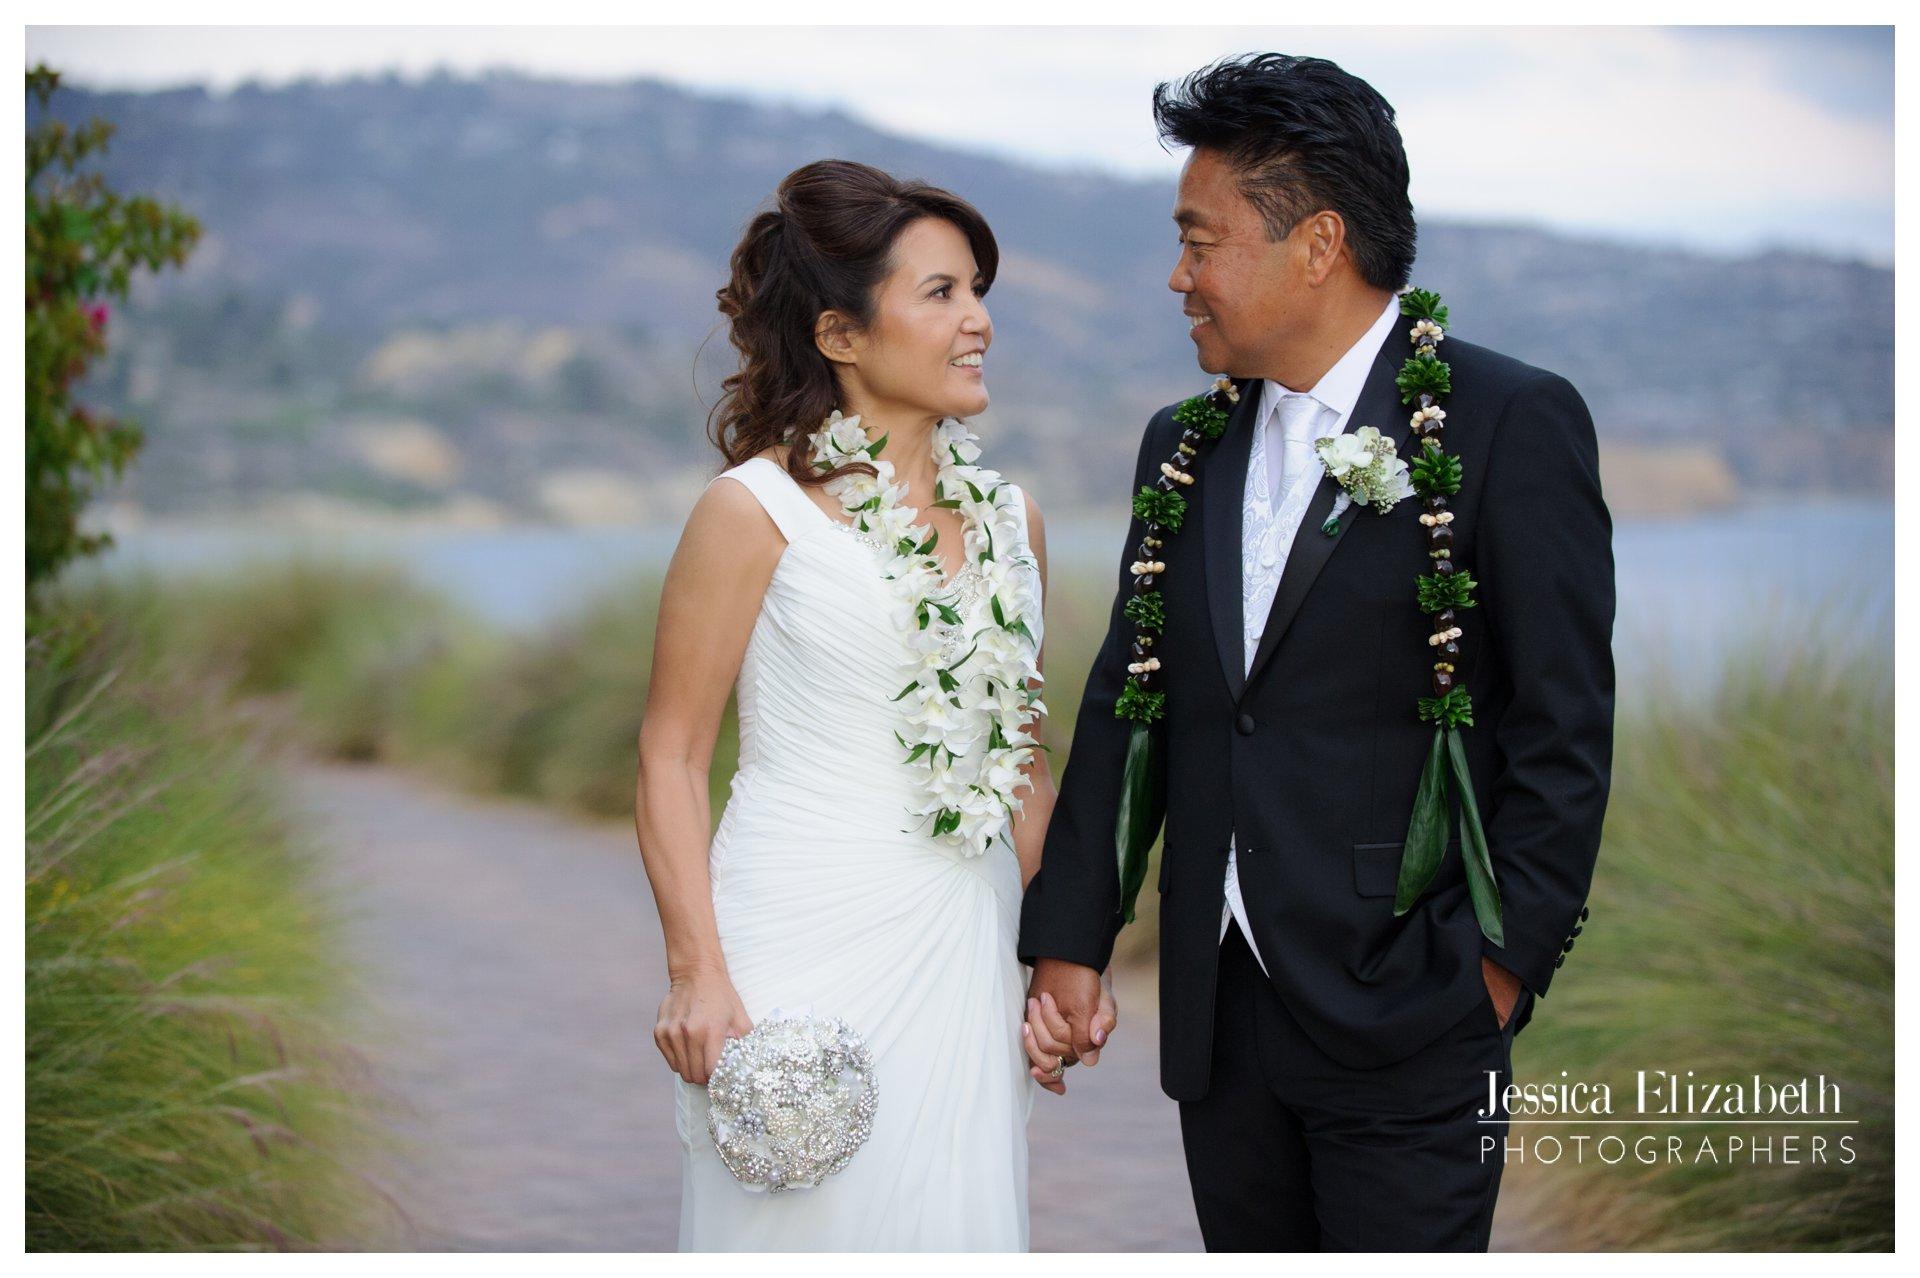 38-Terranea-Palos-Verdes-Wedding-Photography-by-Jessica-Elizabeth-w.jpg